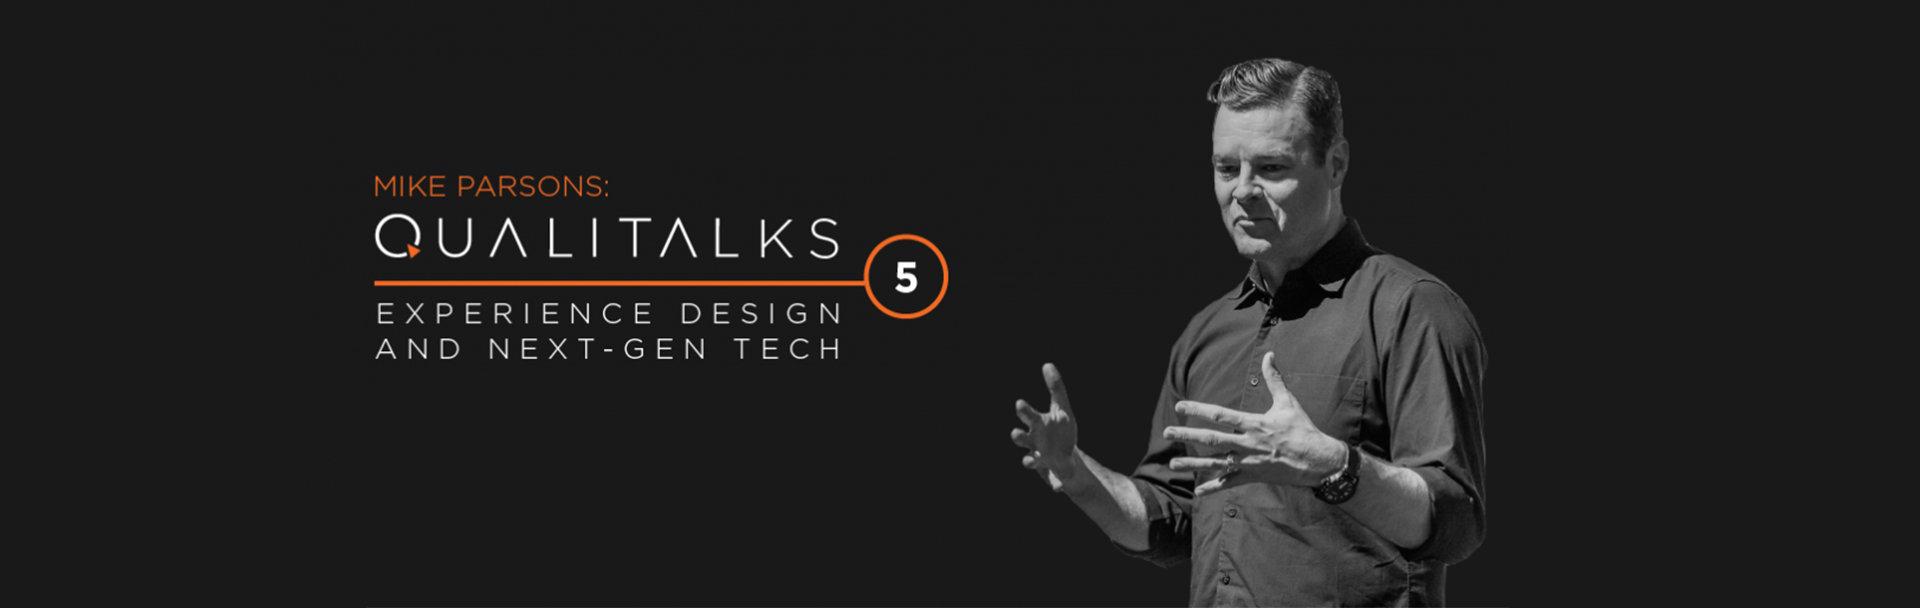 Experience Design and Next-Gen Tech